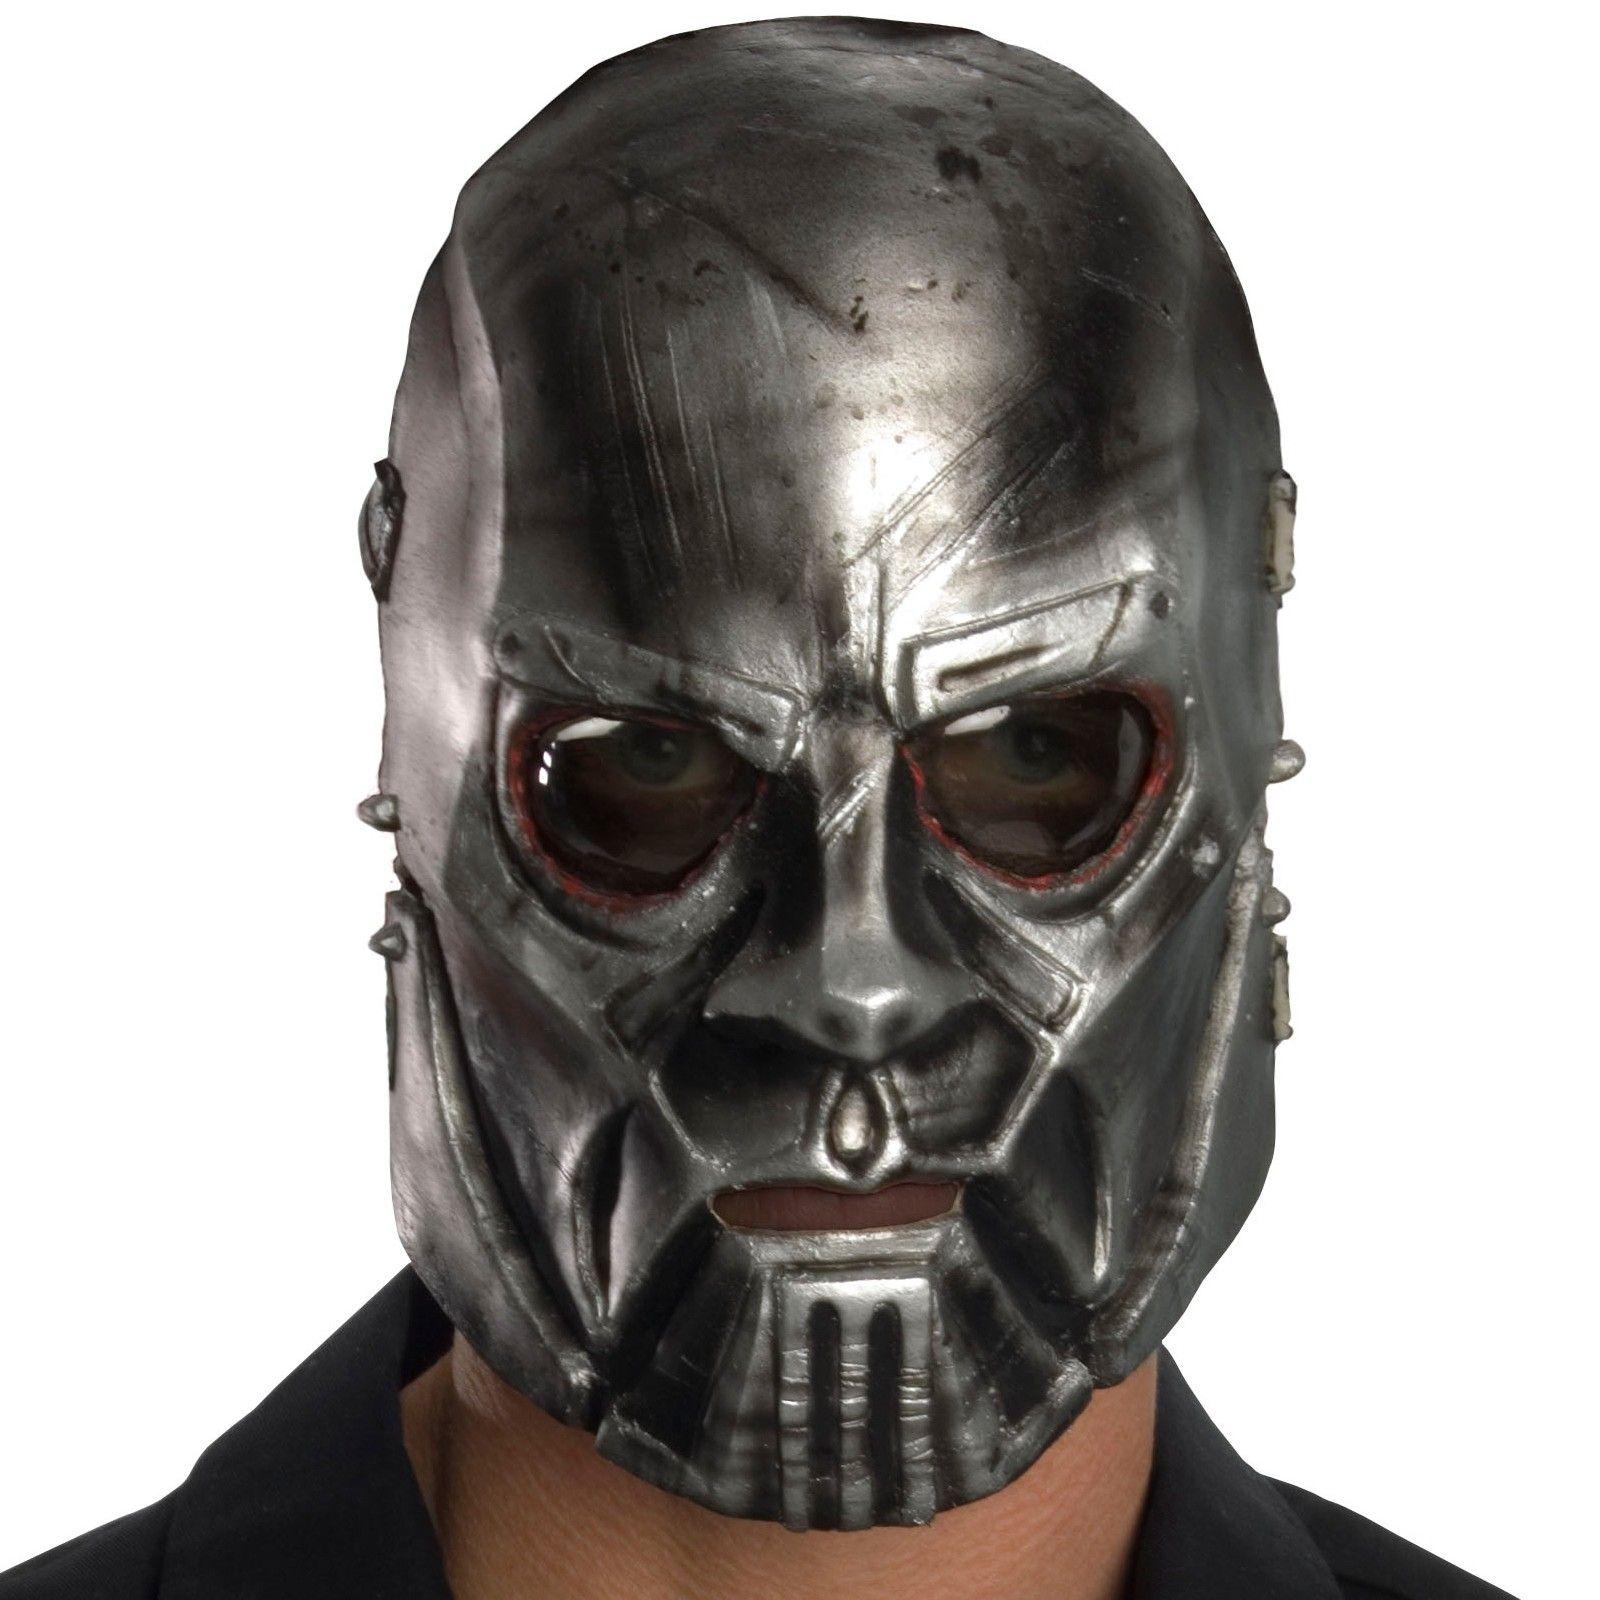 Chris Mask Slipknot Adult Teen Heavy Metal Band Halloween Costume Accessory